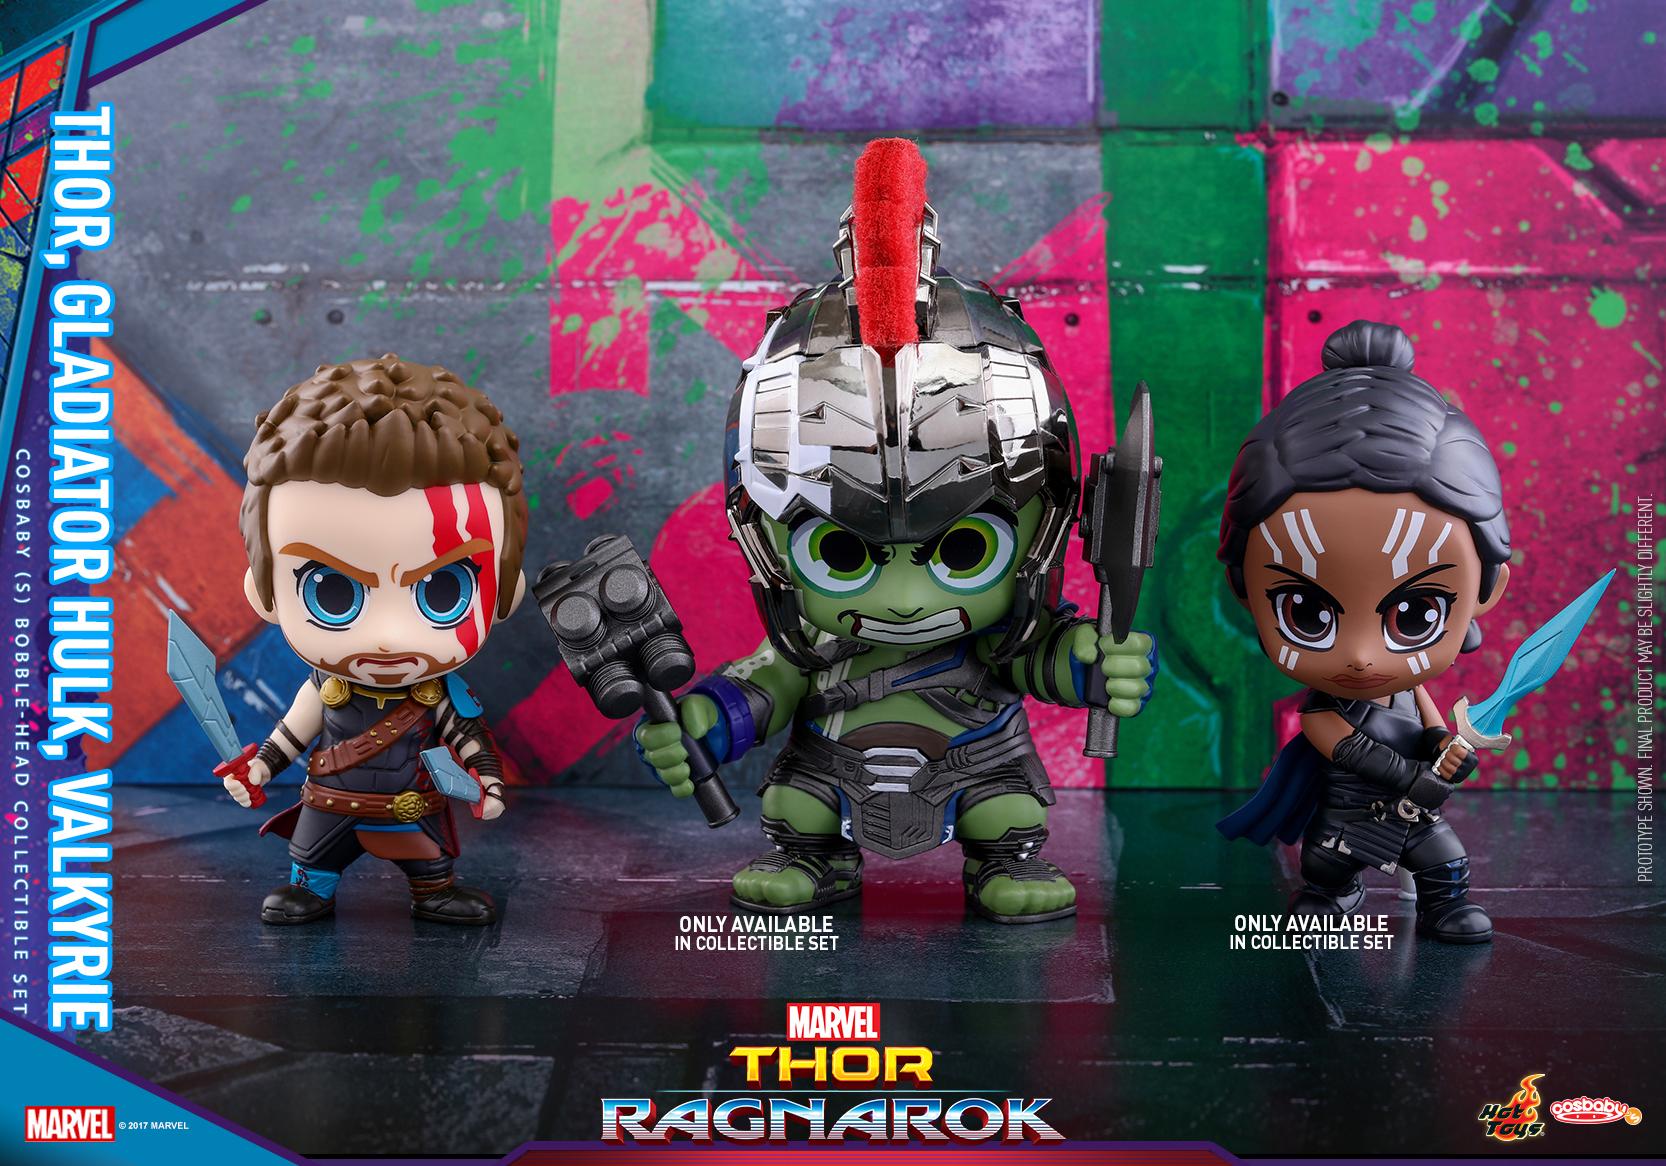 Thor: Ragnarok Cosbaby (s) Bobble-head Series